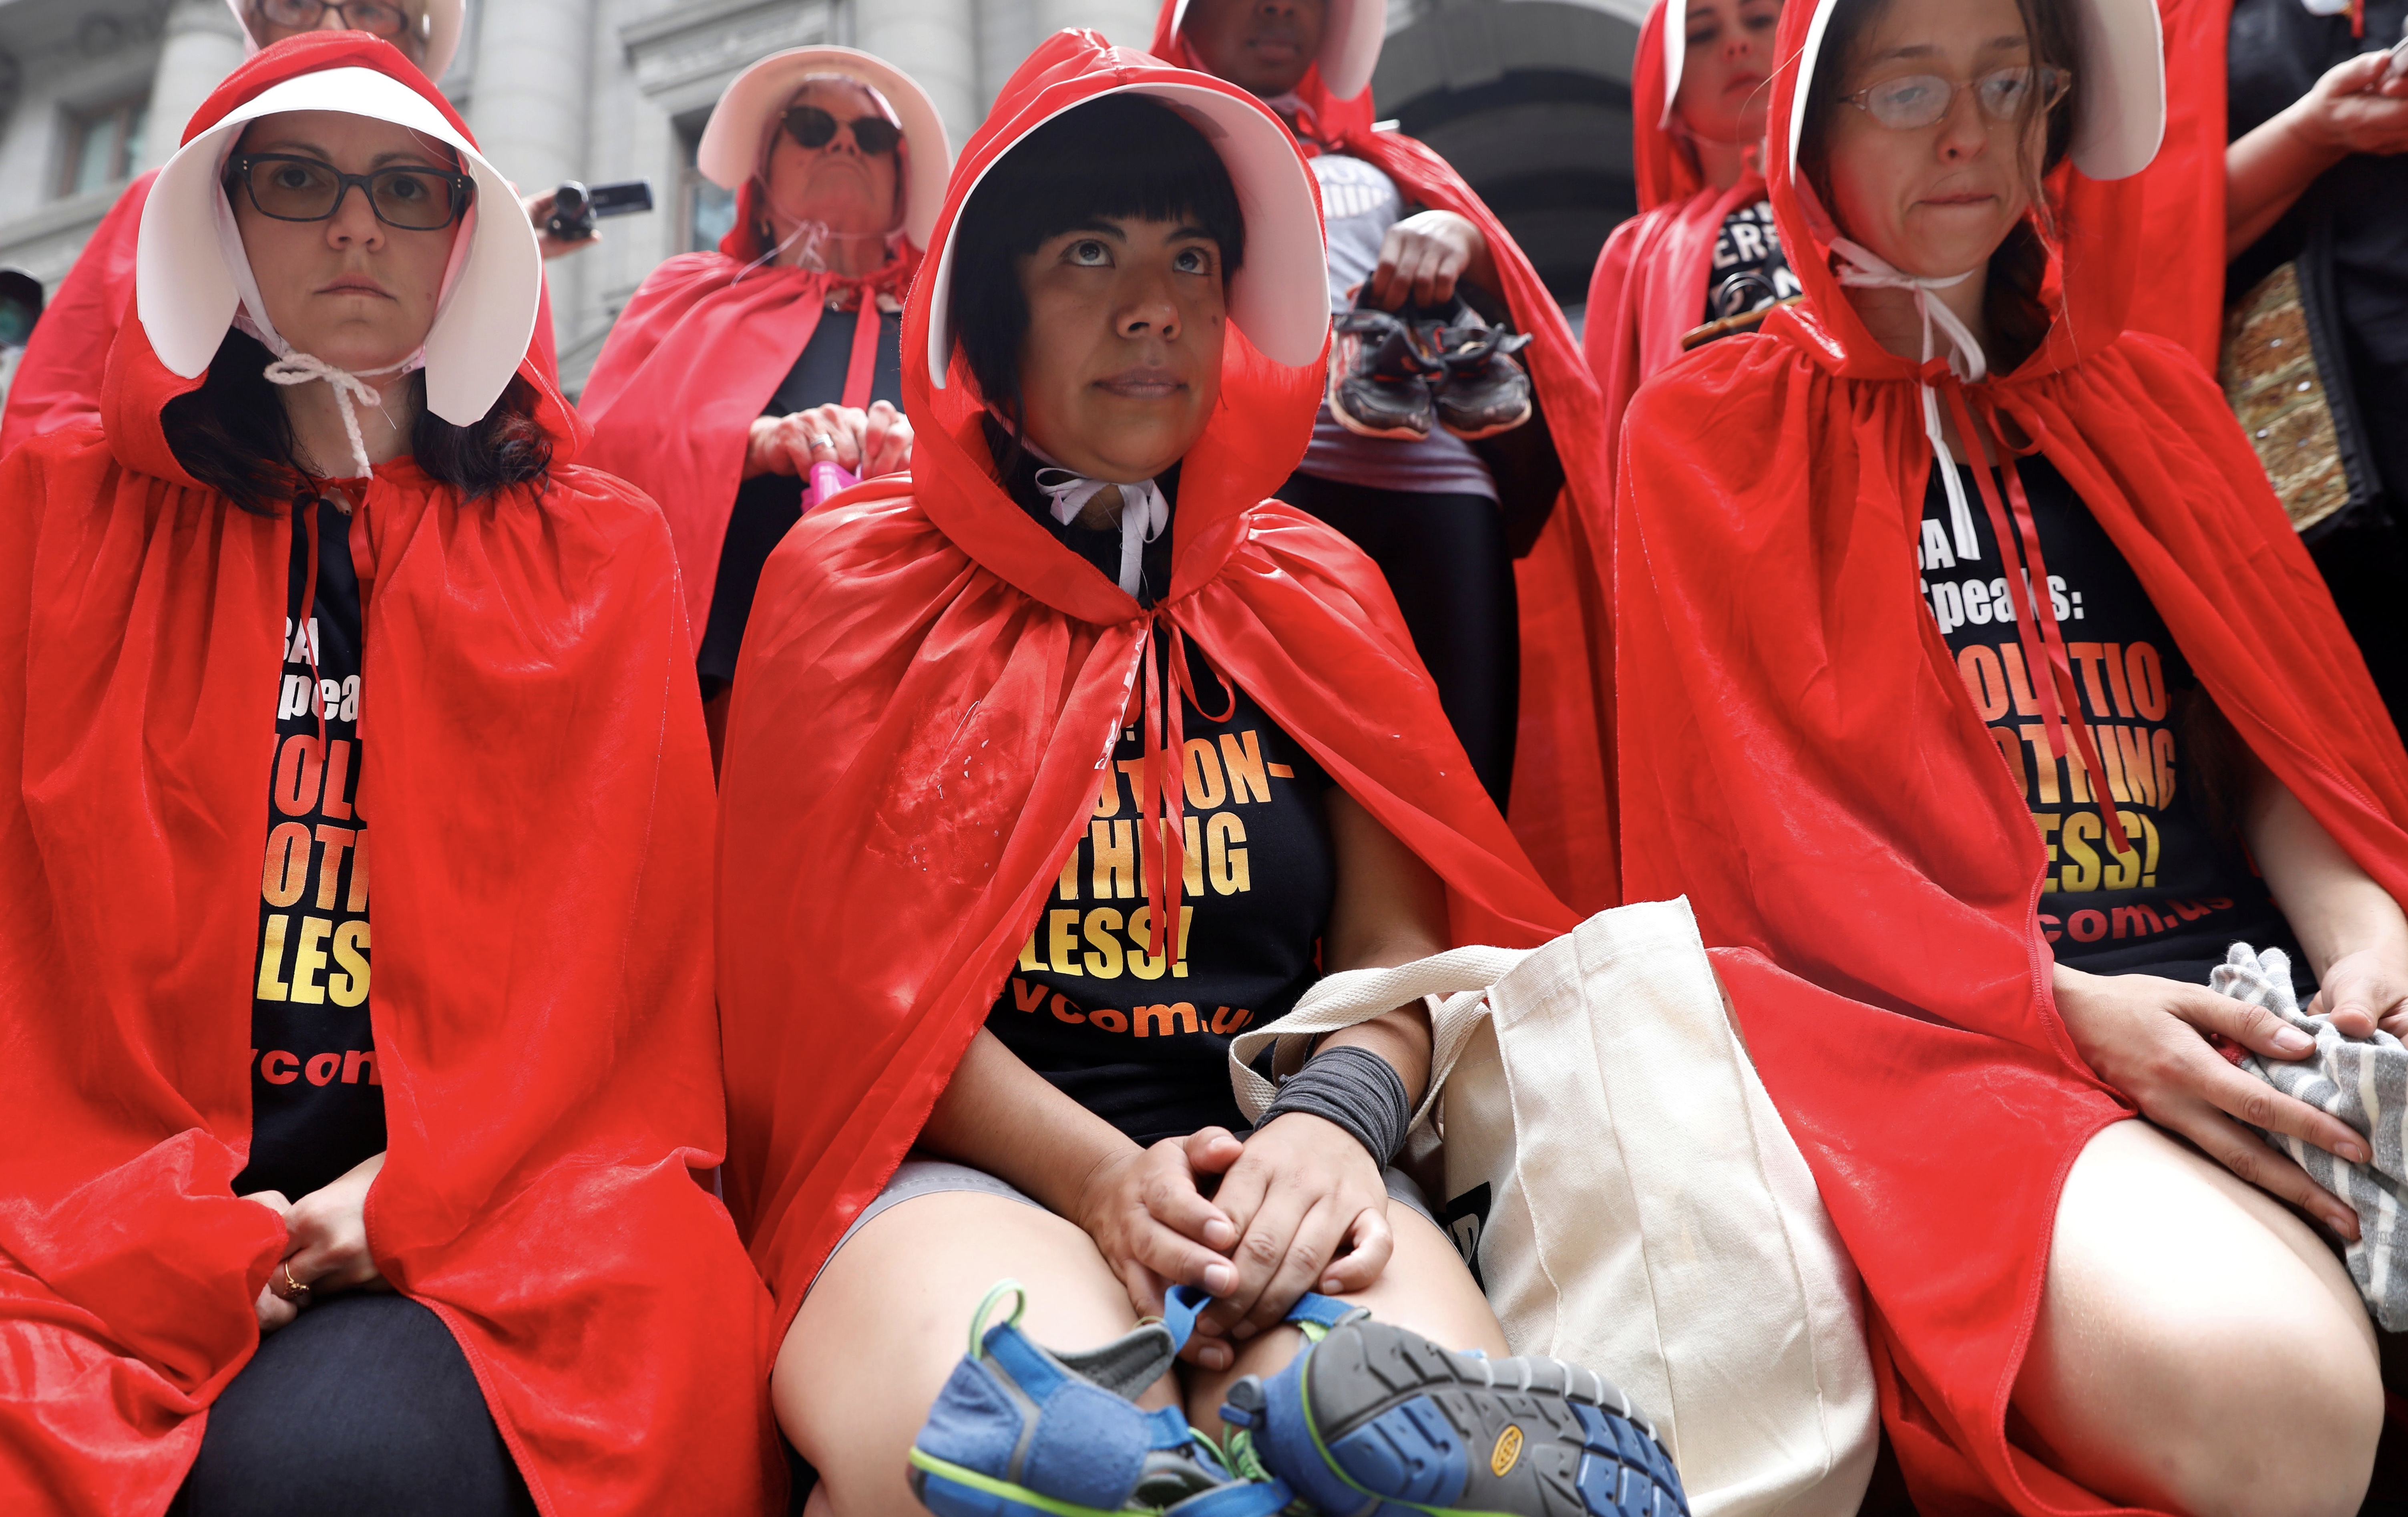 handmaids-protest-pence-ap-img